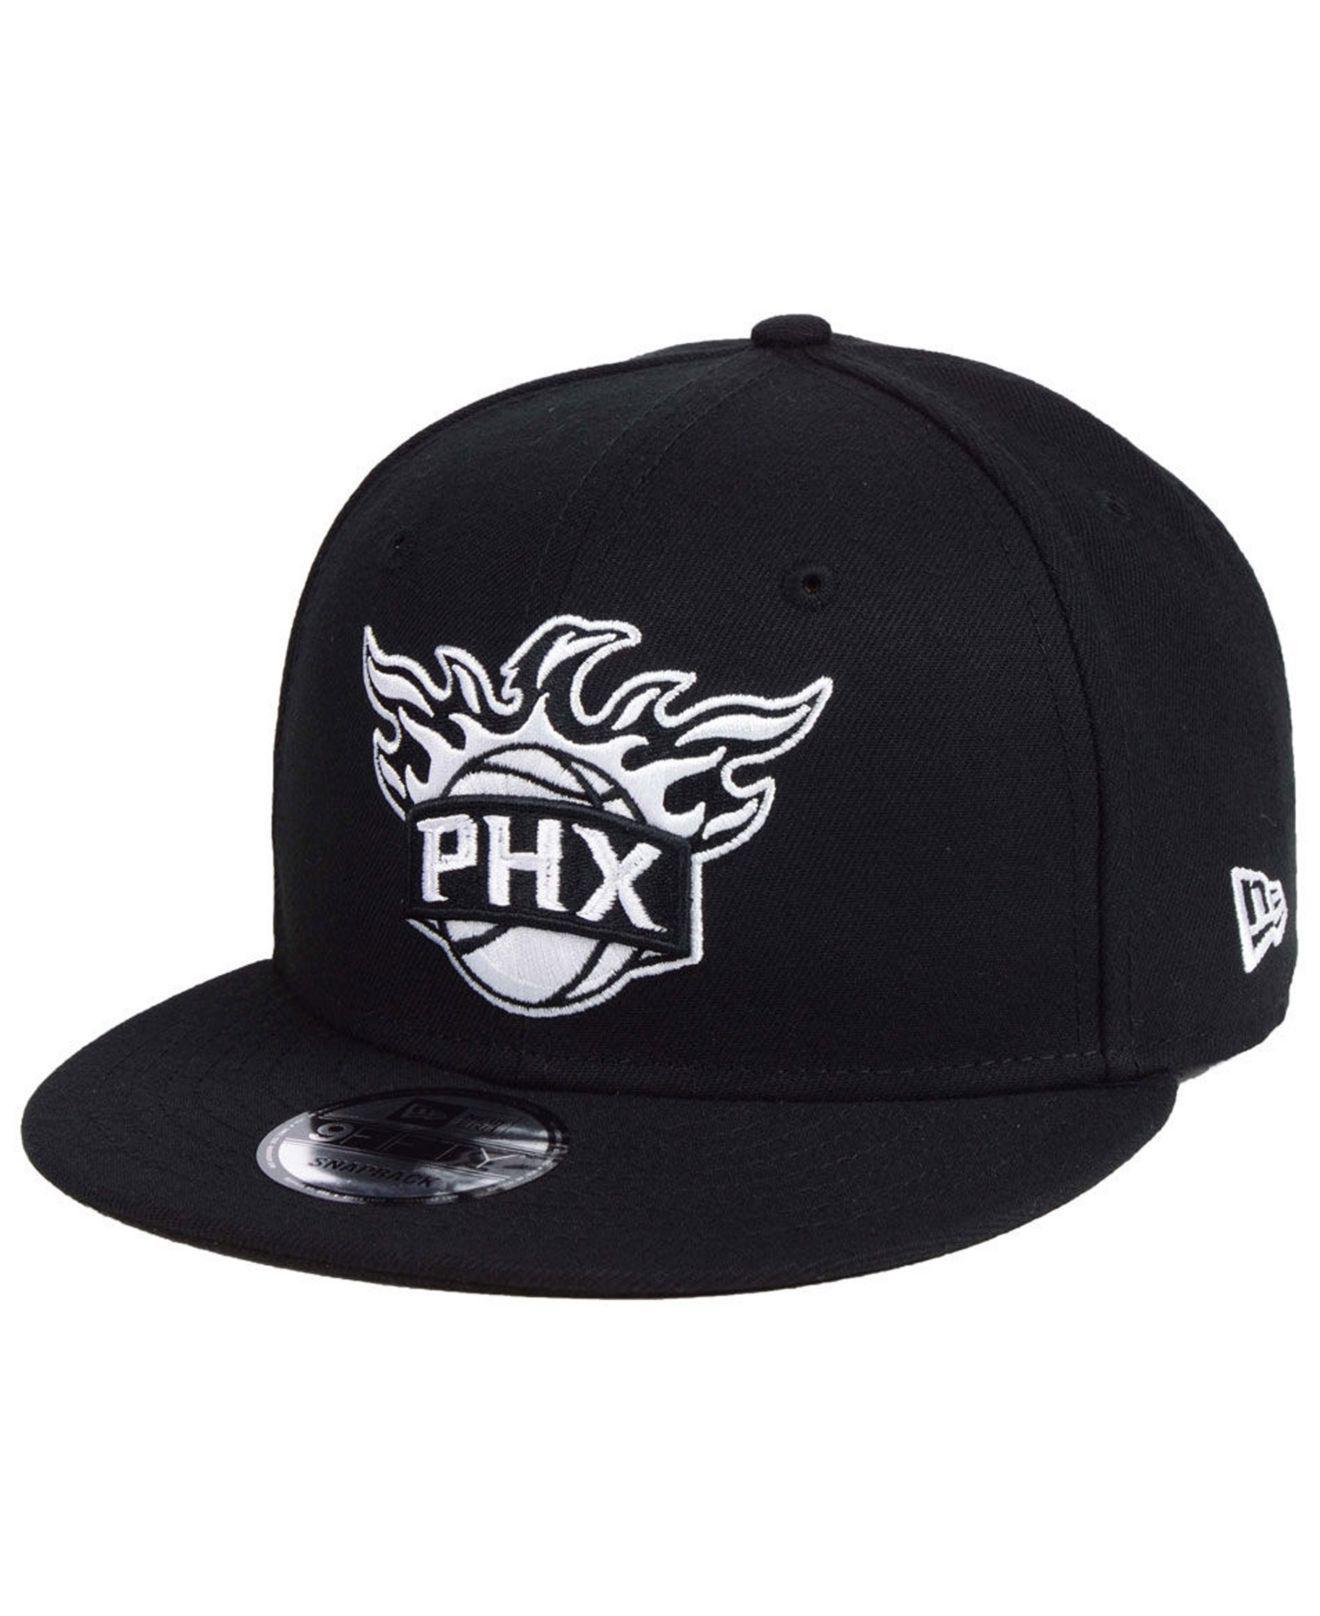 quality design c4baf 3cace ... uk ktz phoenix suns black white 9fifty snapback cap for men lyst. view  fullscreen 77898